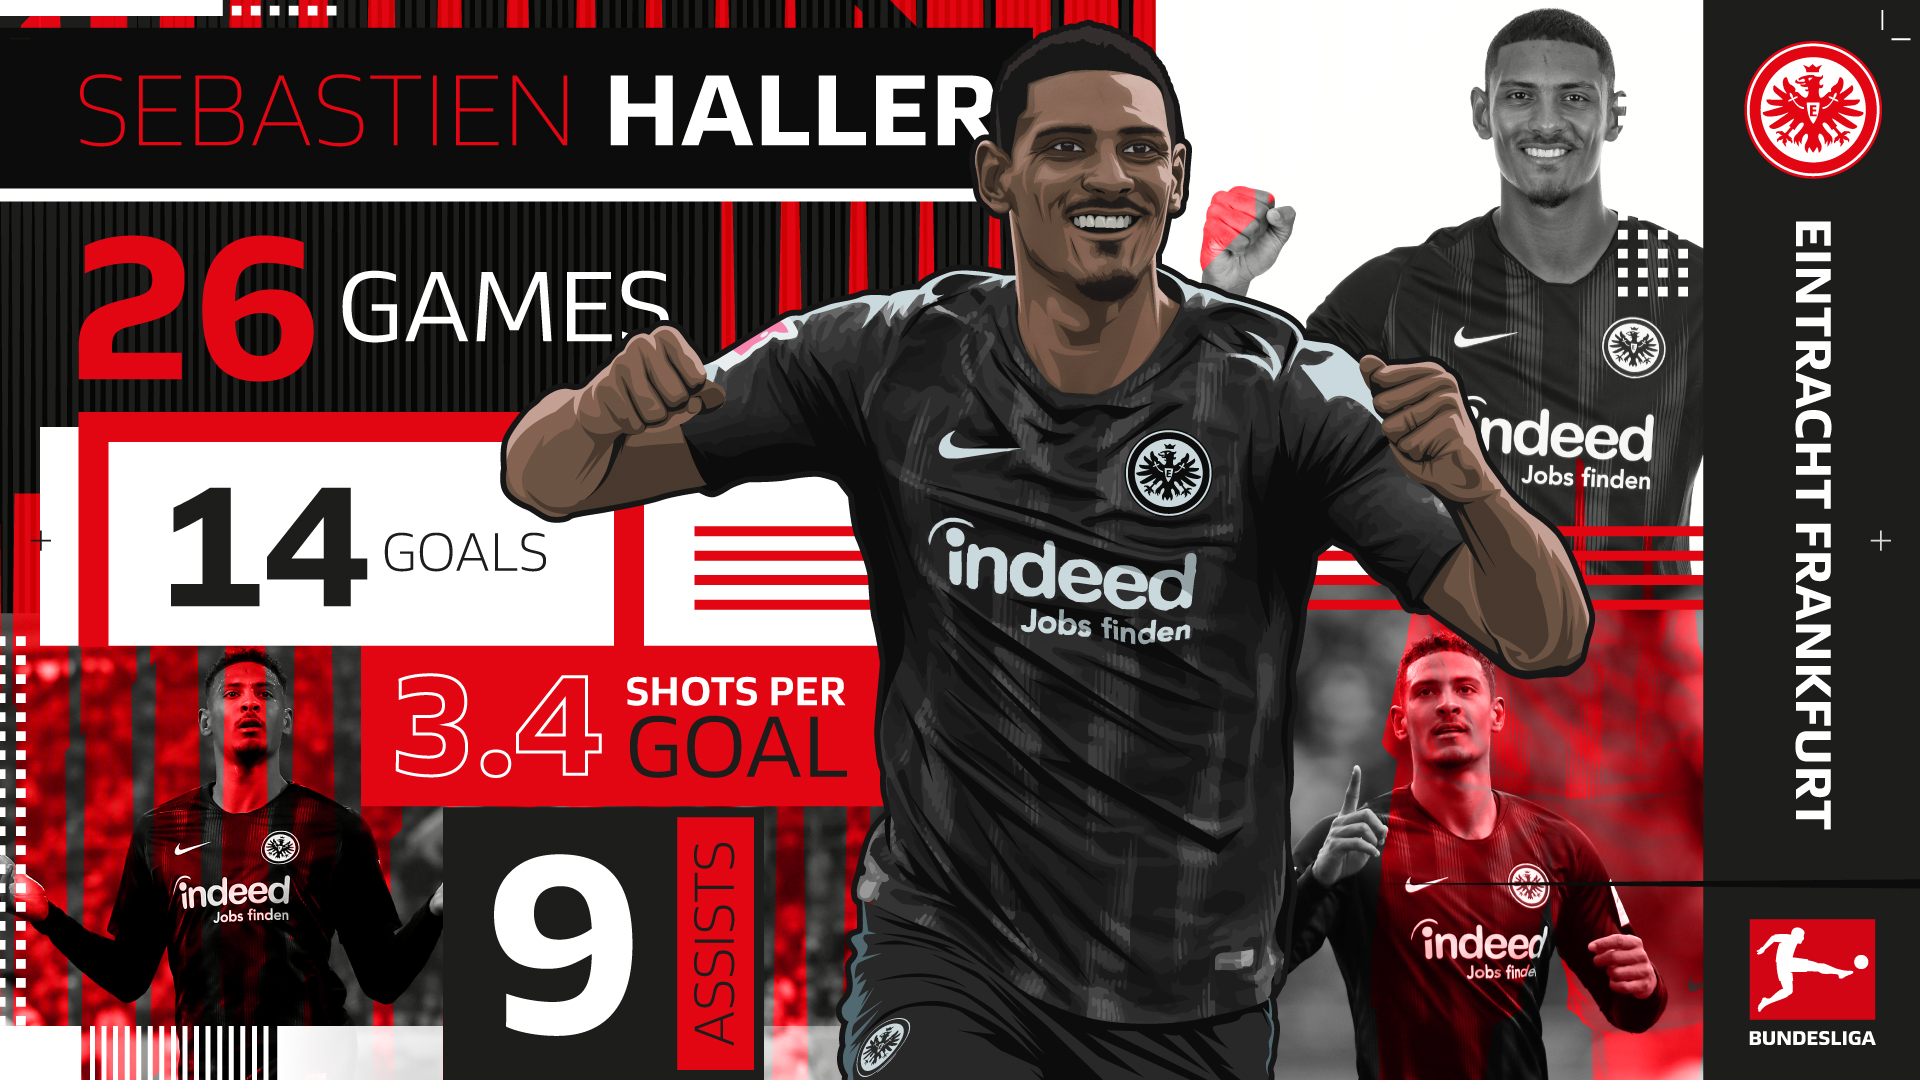 Haller-stats-1920x1080